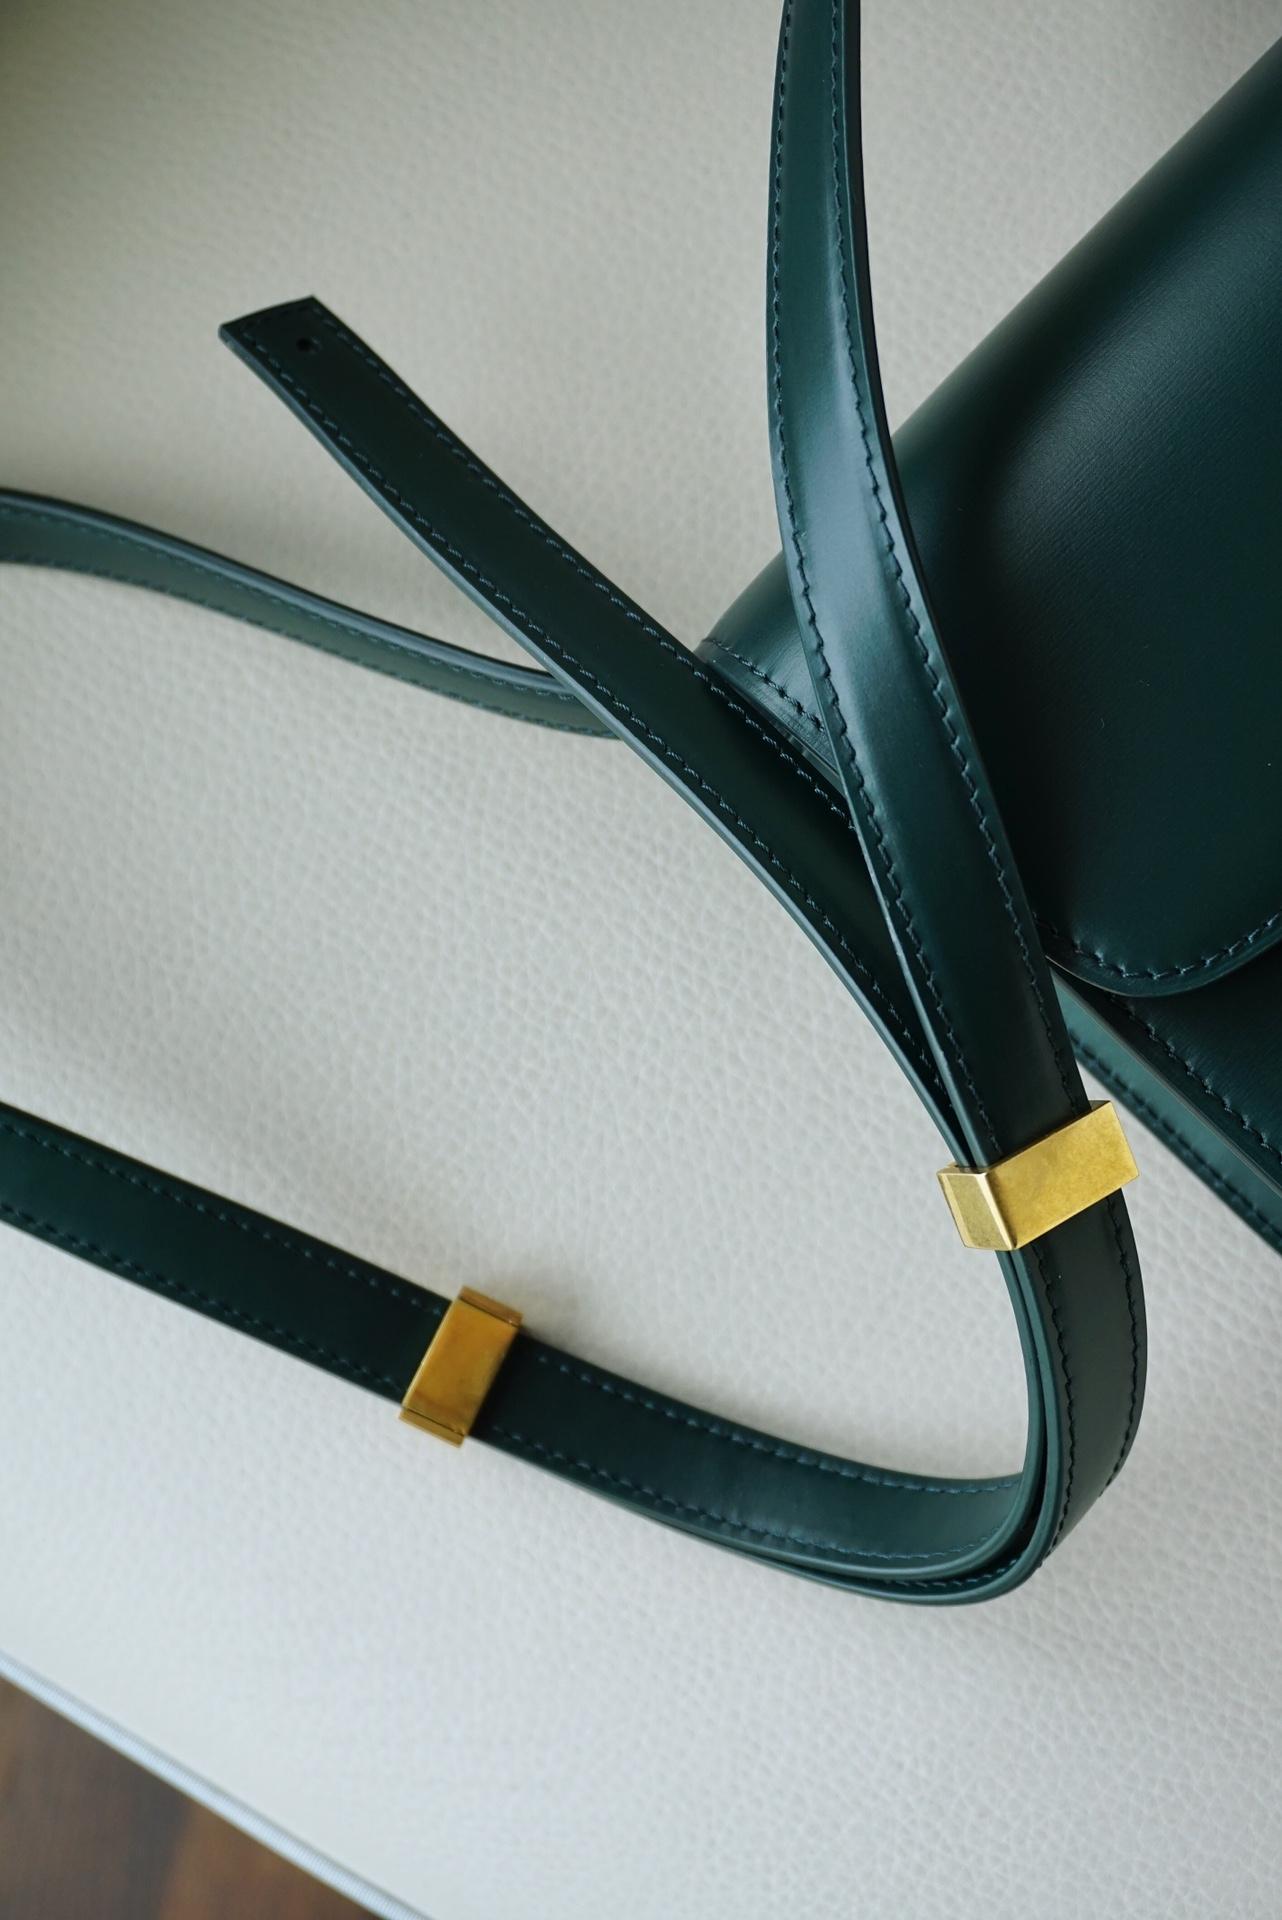 Celine 思琳 Box 豆腐包 Teen 18.5cm 墨绿色,极具70年代风格